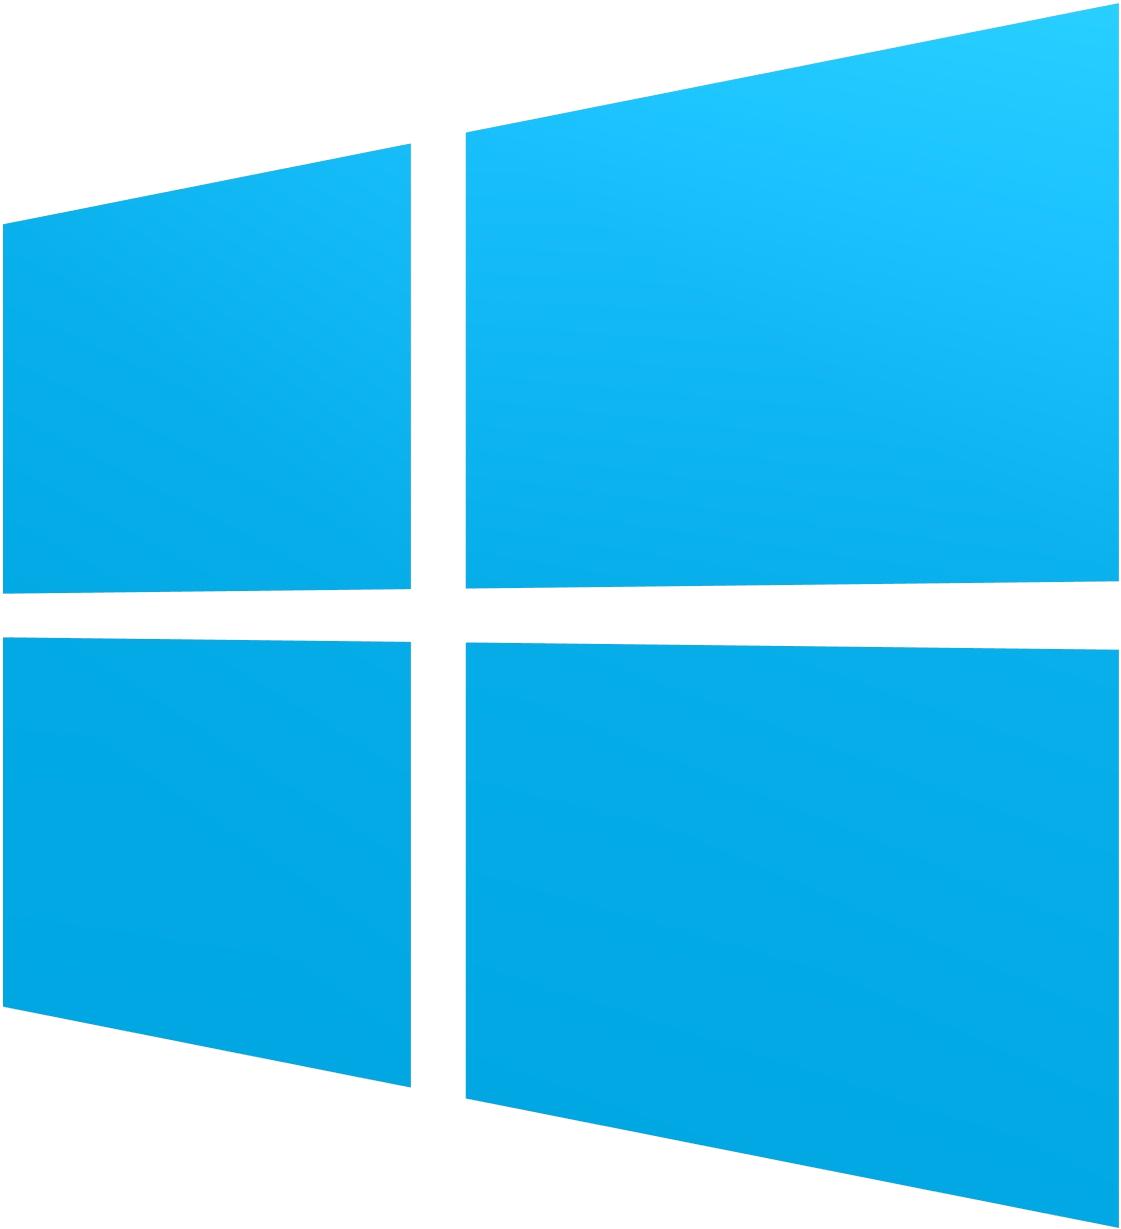 File:Windows logo - 2012.png - Microsoft Windows PNG